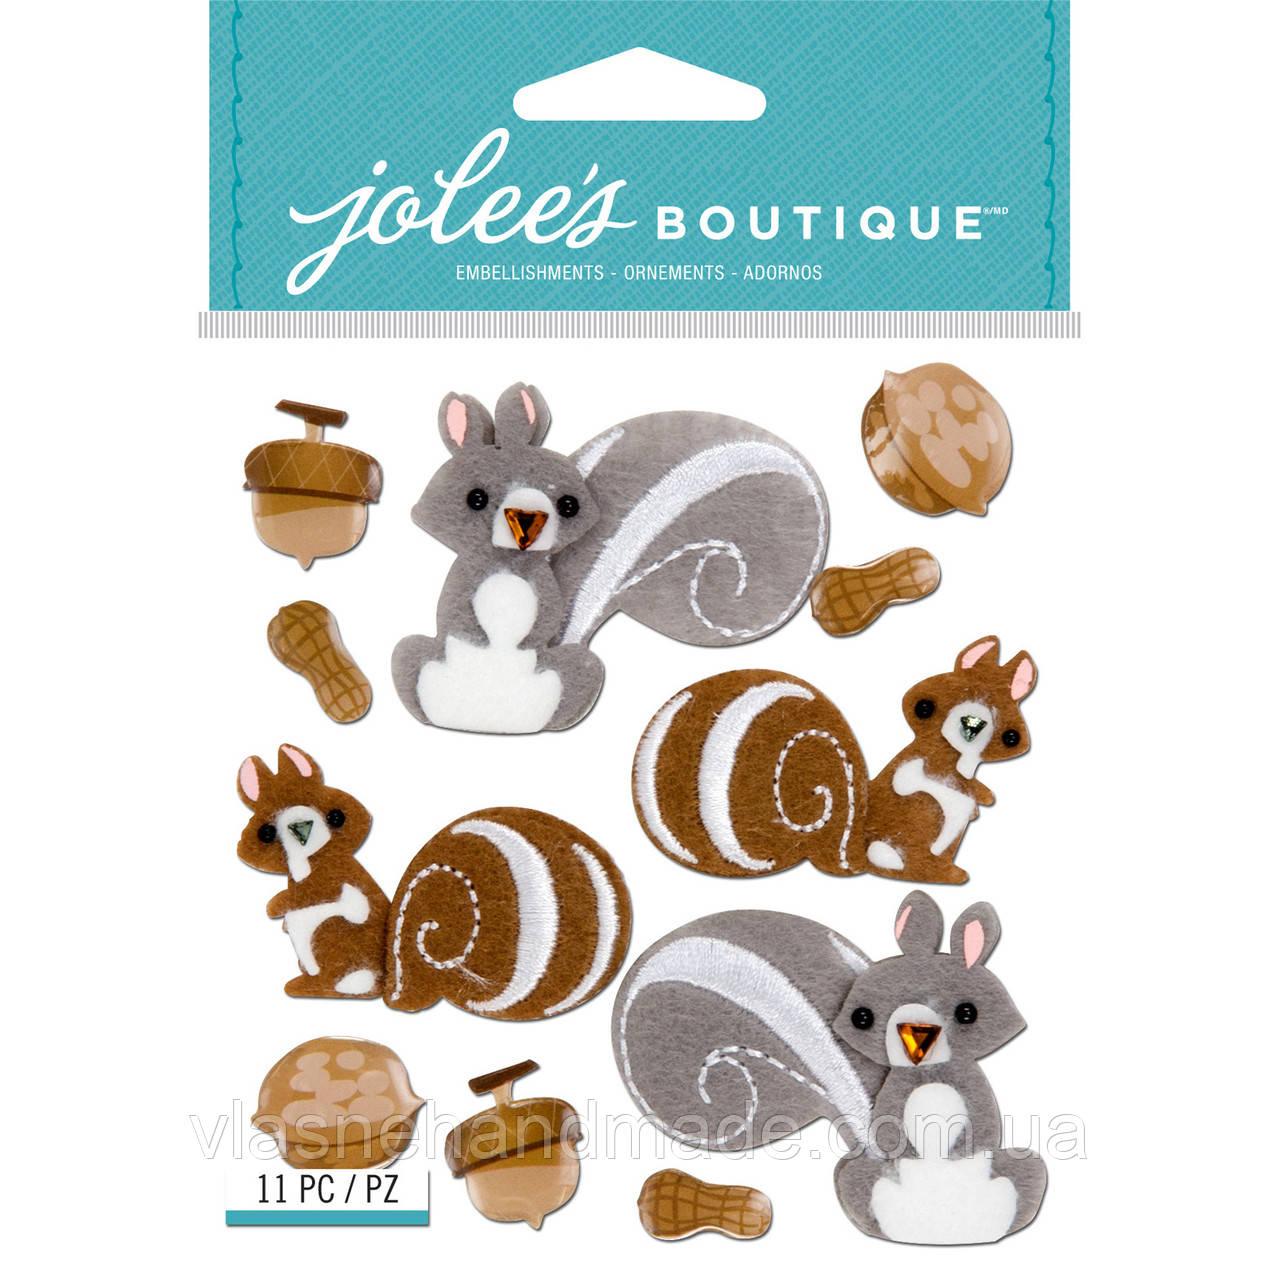 Наклейки з фетру 3D - SQUIRRELS AND NUTS - Jolee's Boutique - 11 шт.